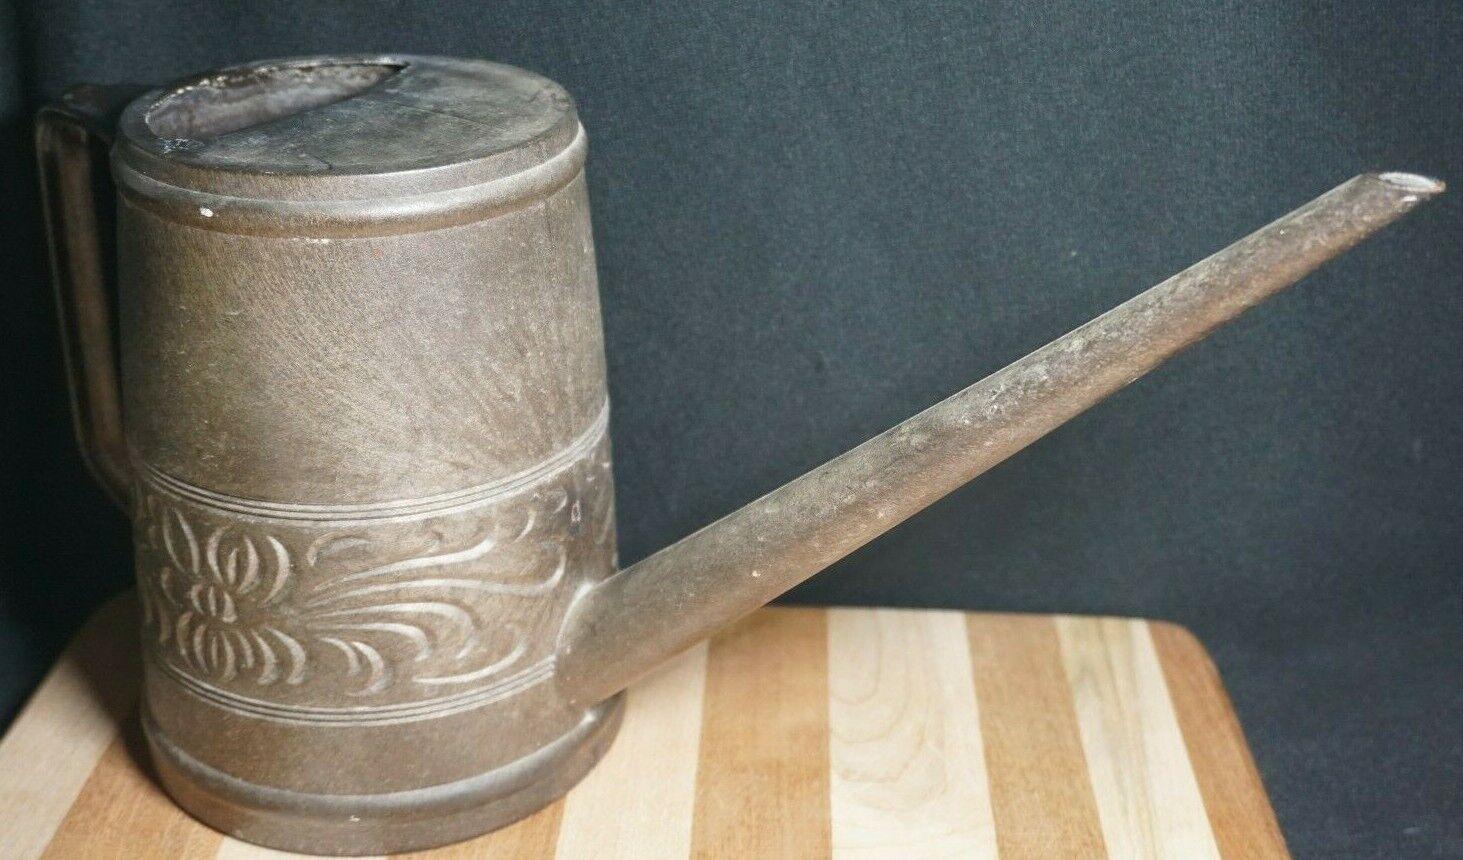 Swedish Small Vintage Garden Watering Can Hard Durable Plastic 1.8L Decor